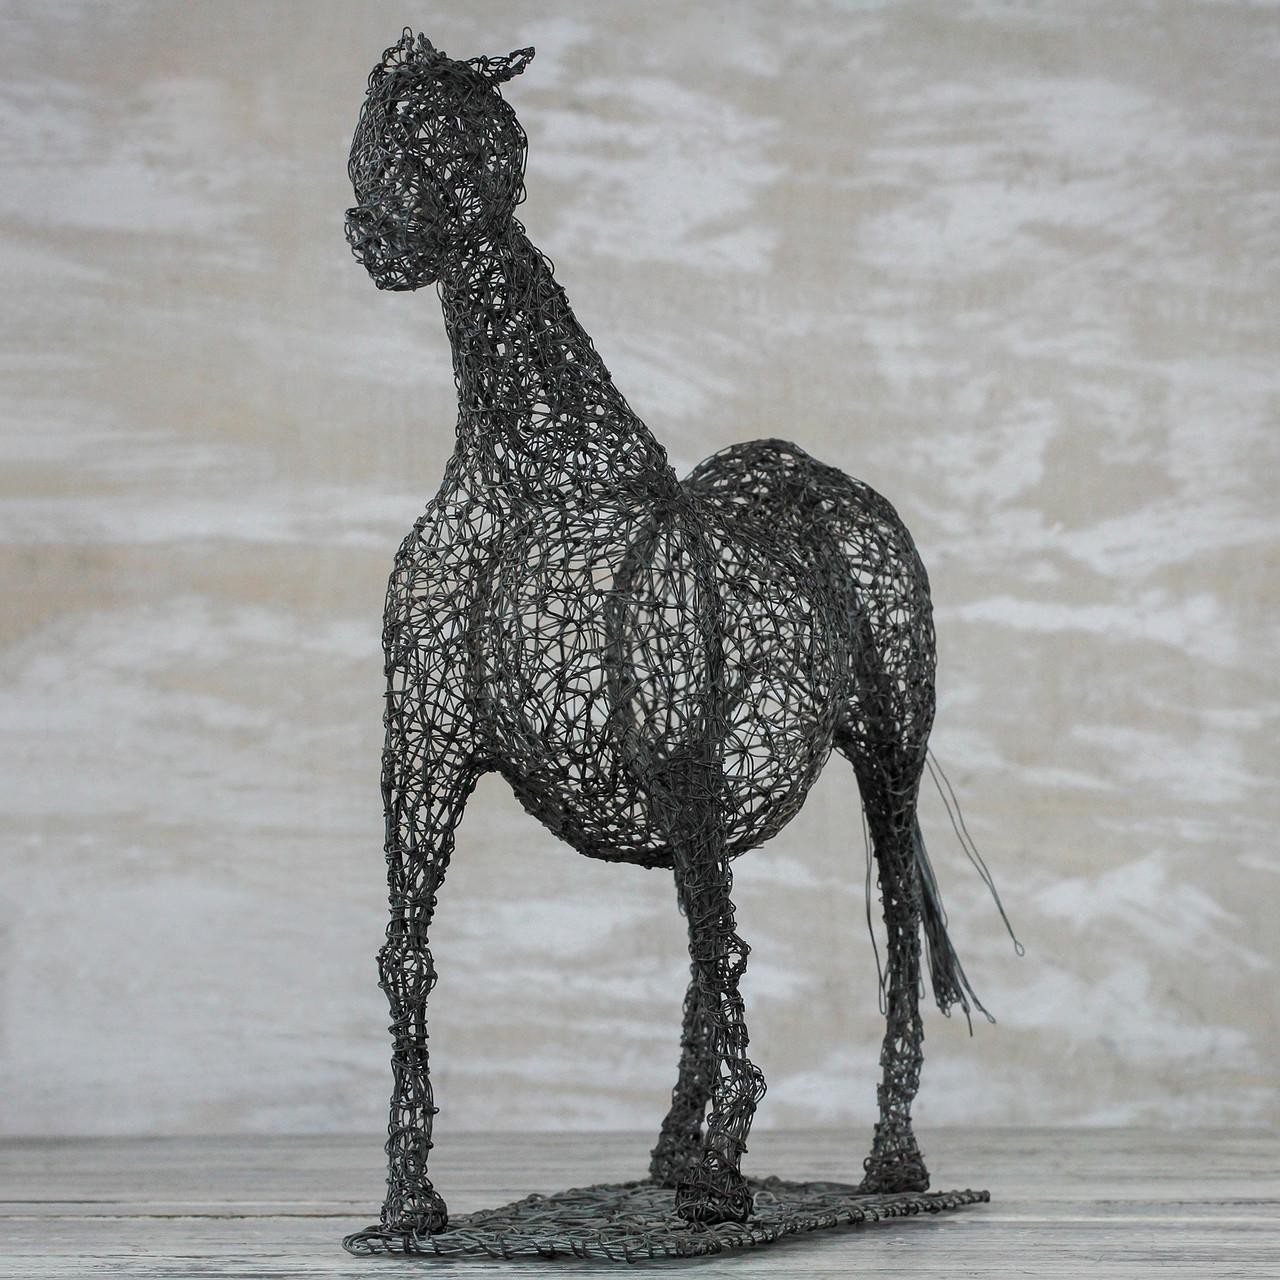 Steel Wire Sculpture Of A Horse Crafted In Ghana Modern Horse Road Scholar World Bazaar